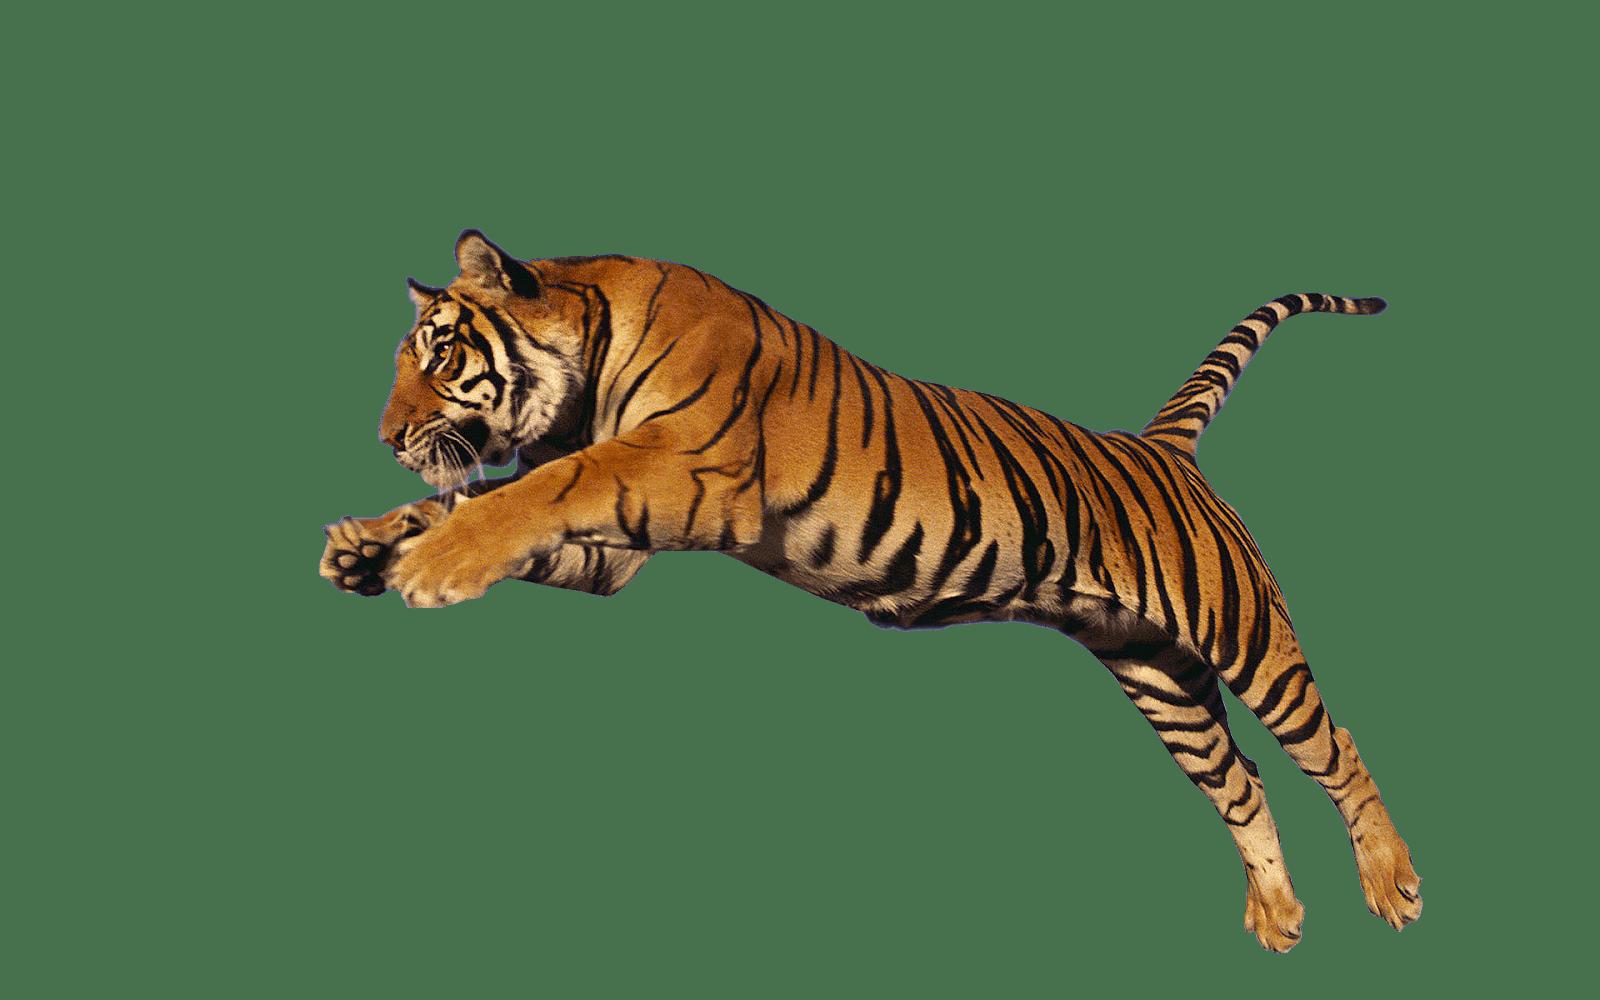 Tiger Jump High - Tiger PNG